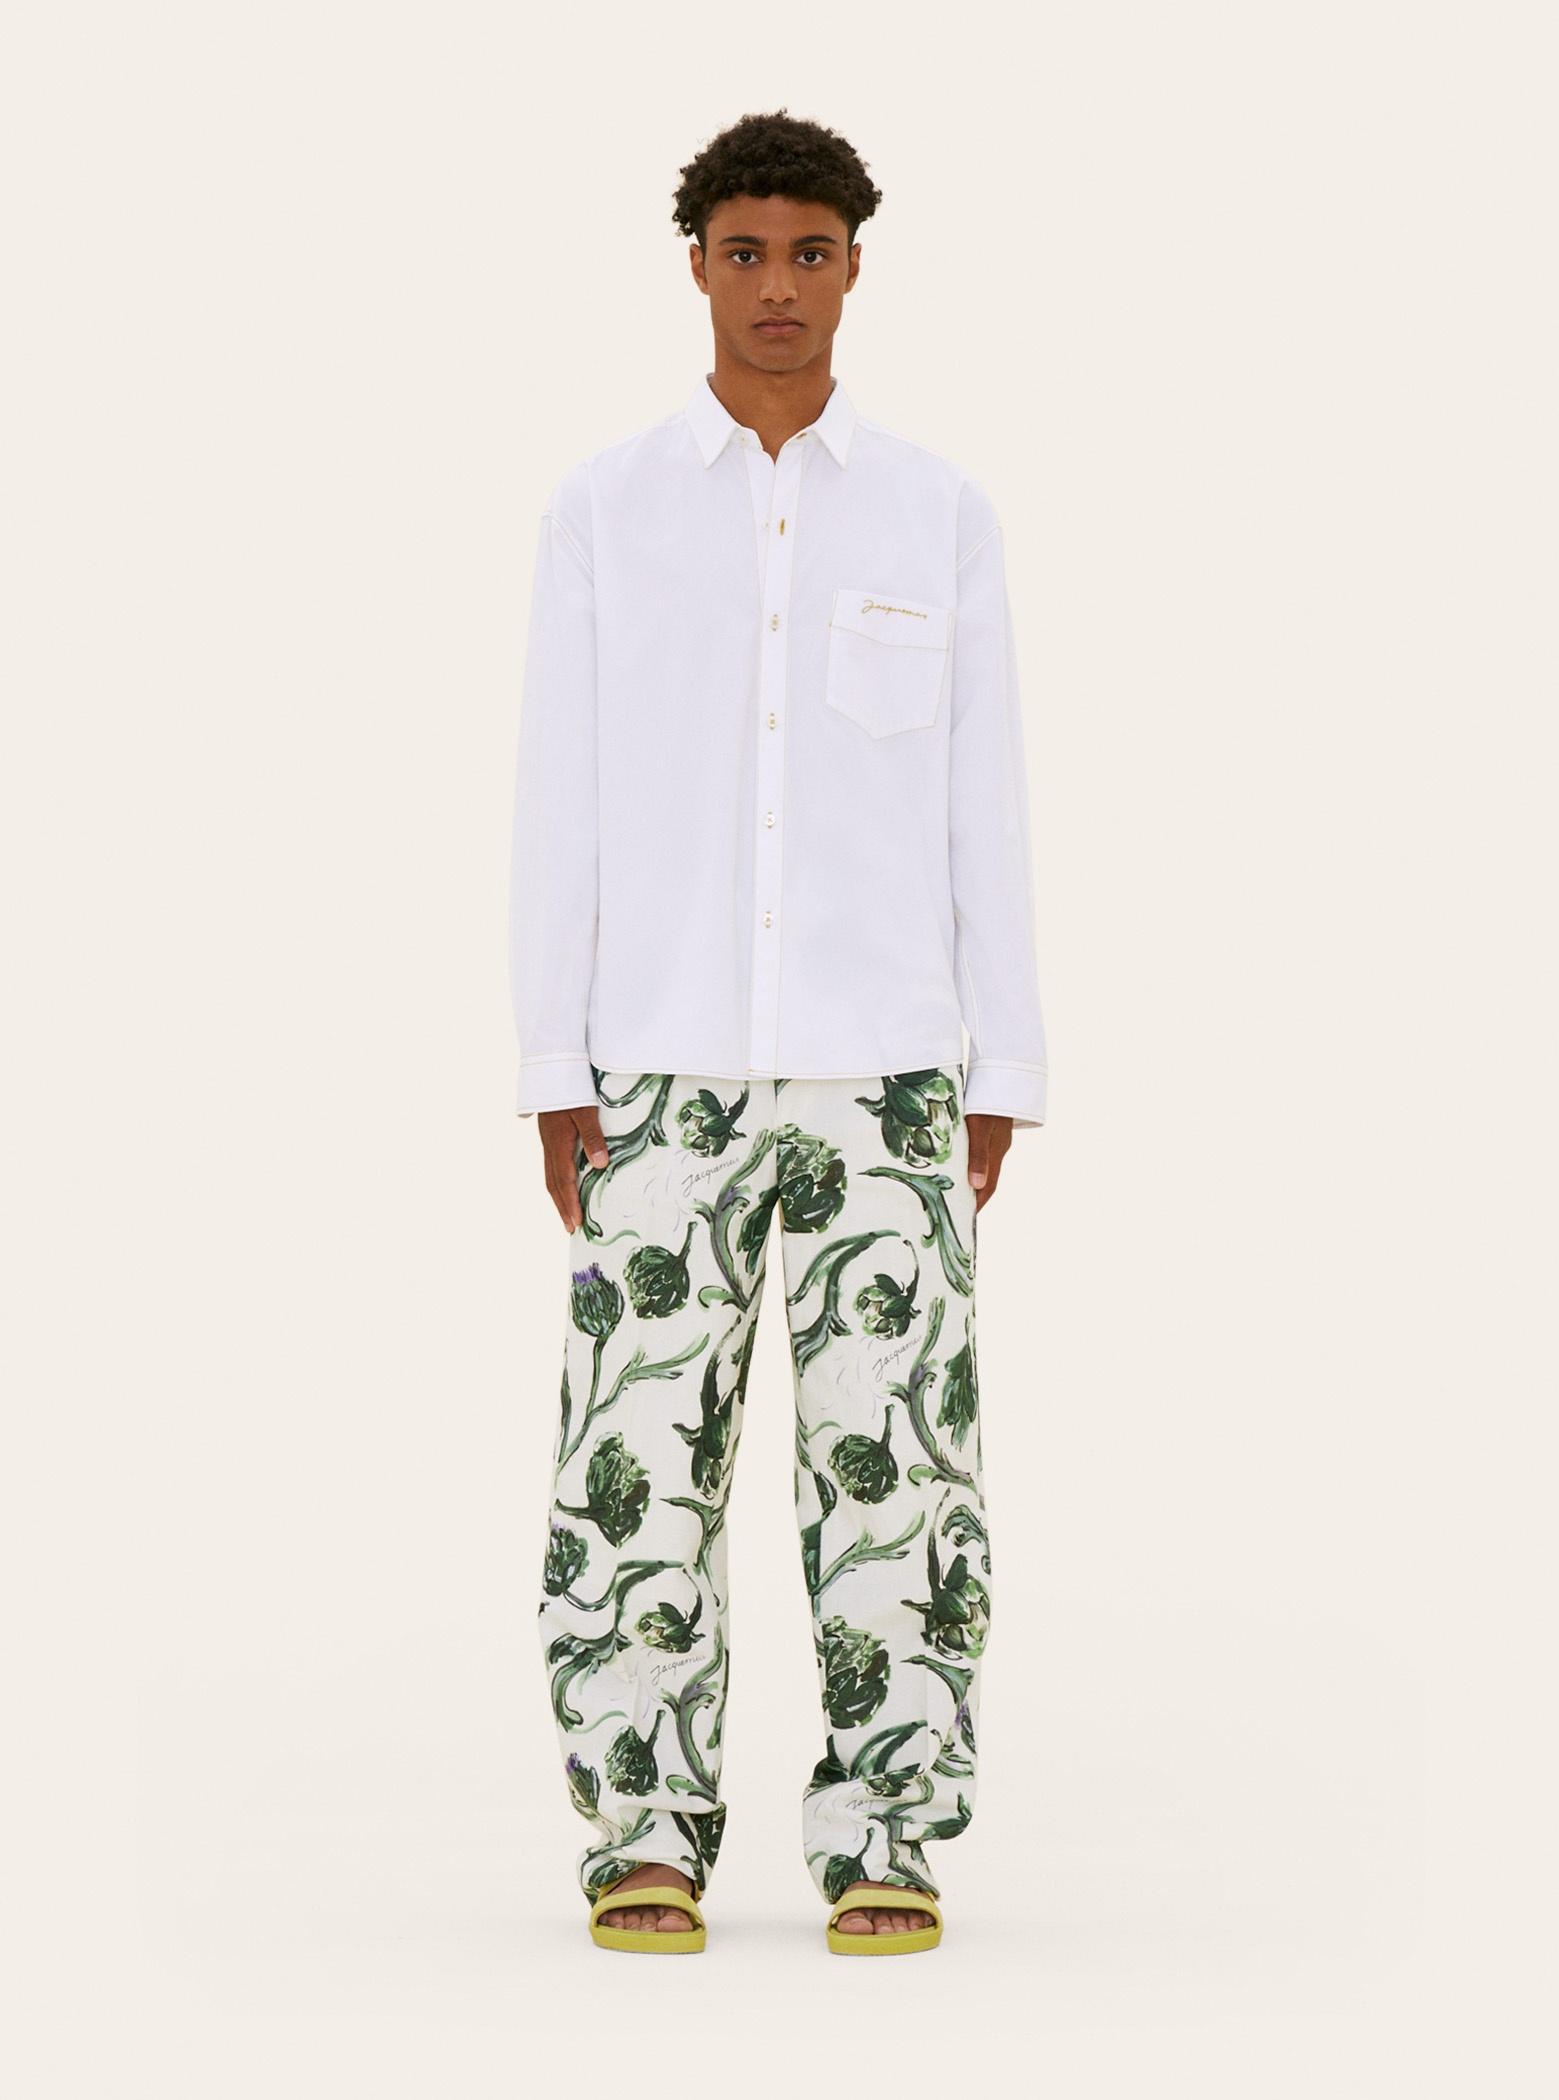 Le pantalon de costume